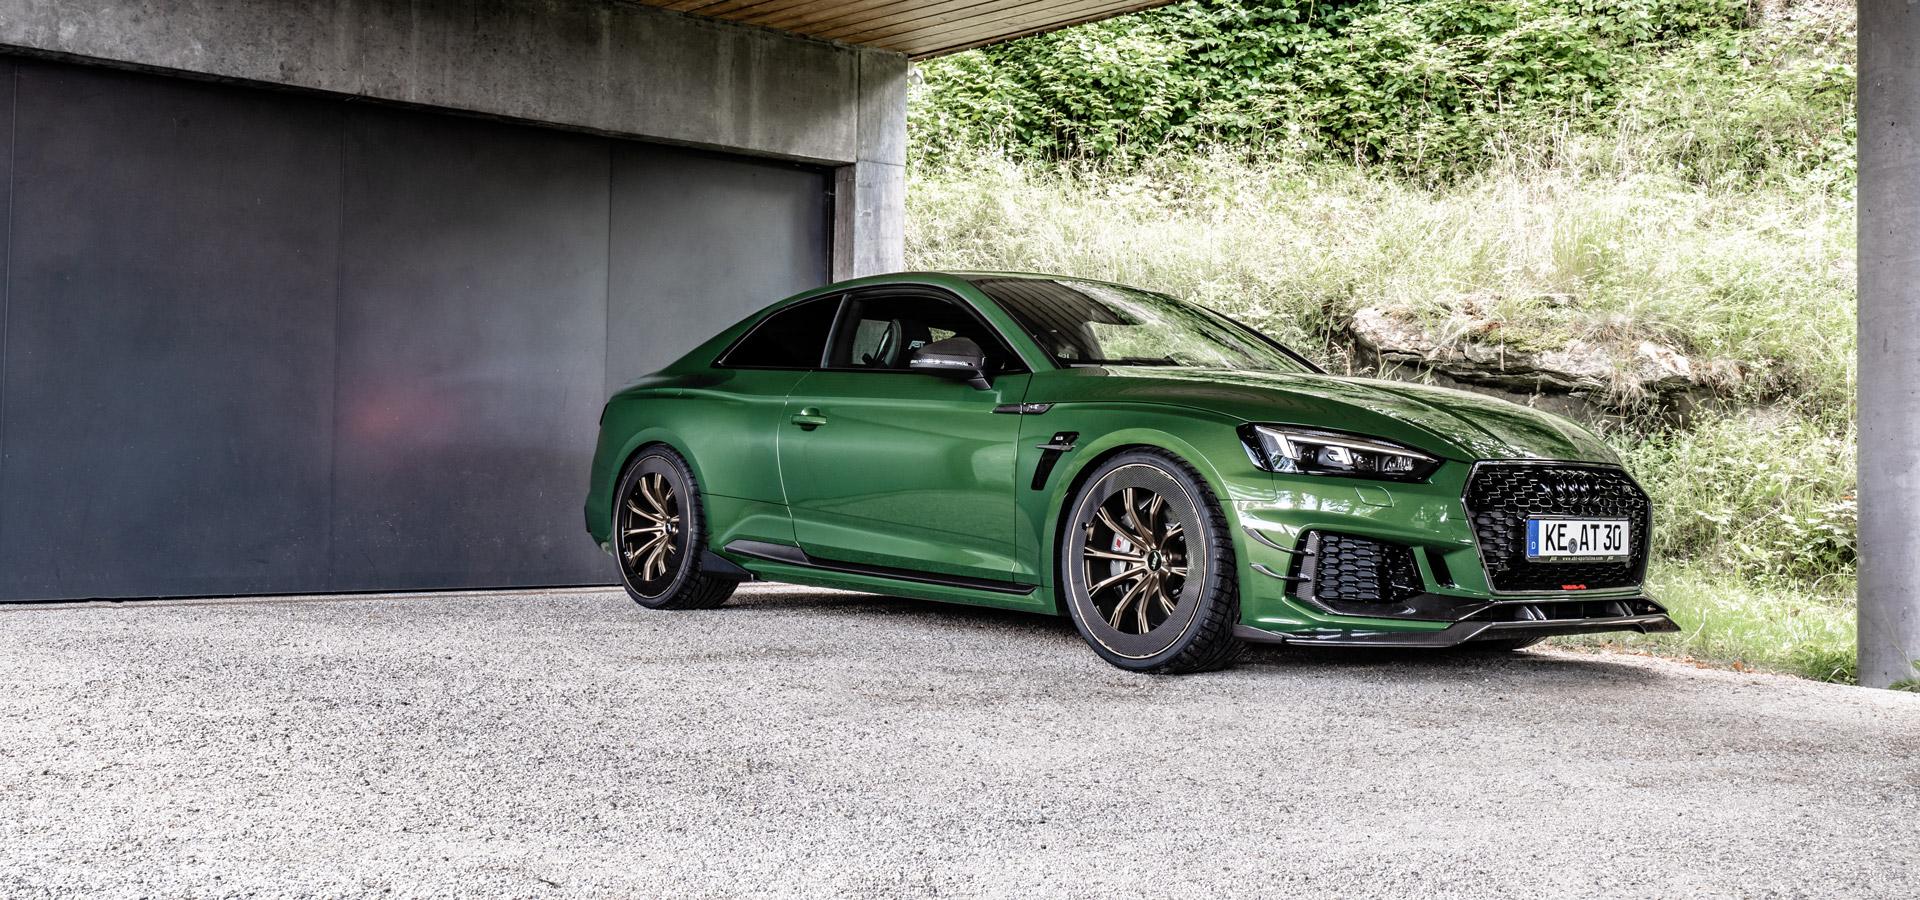 Tuning ABT Sportsline - Audi performance cars